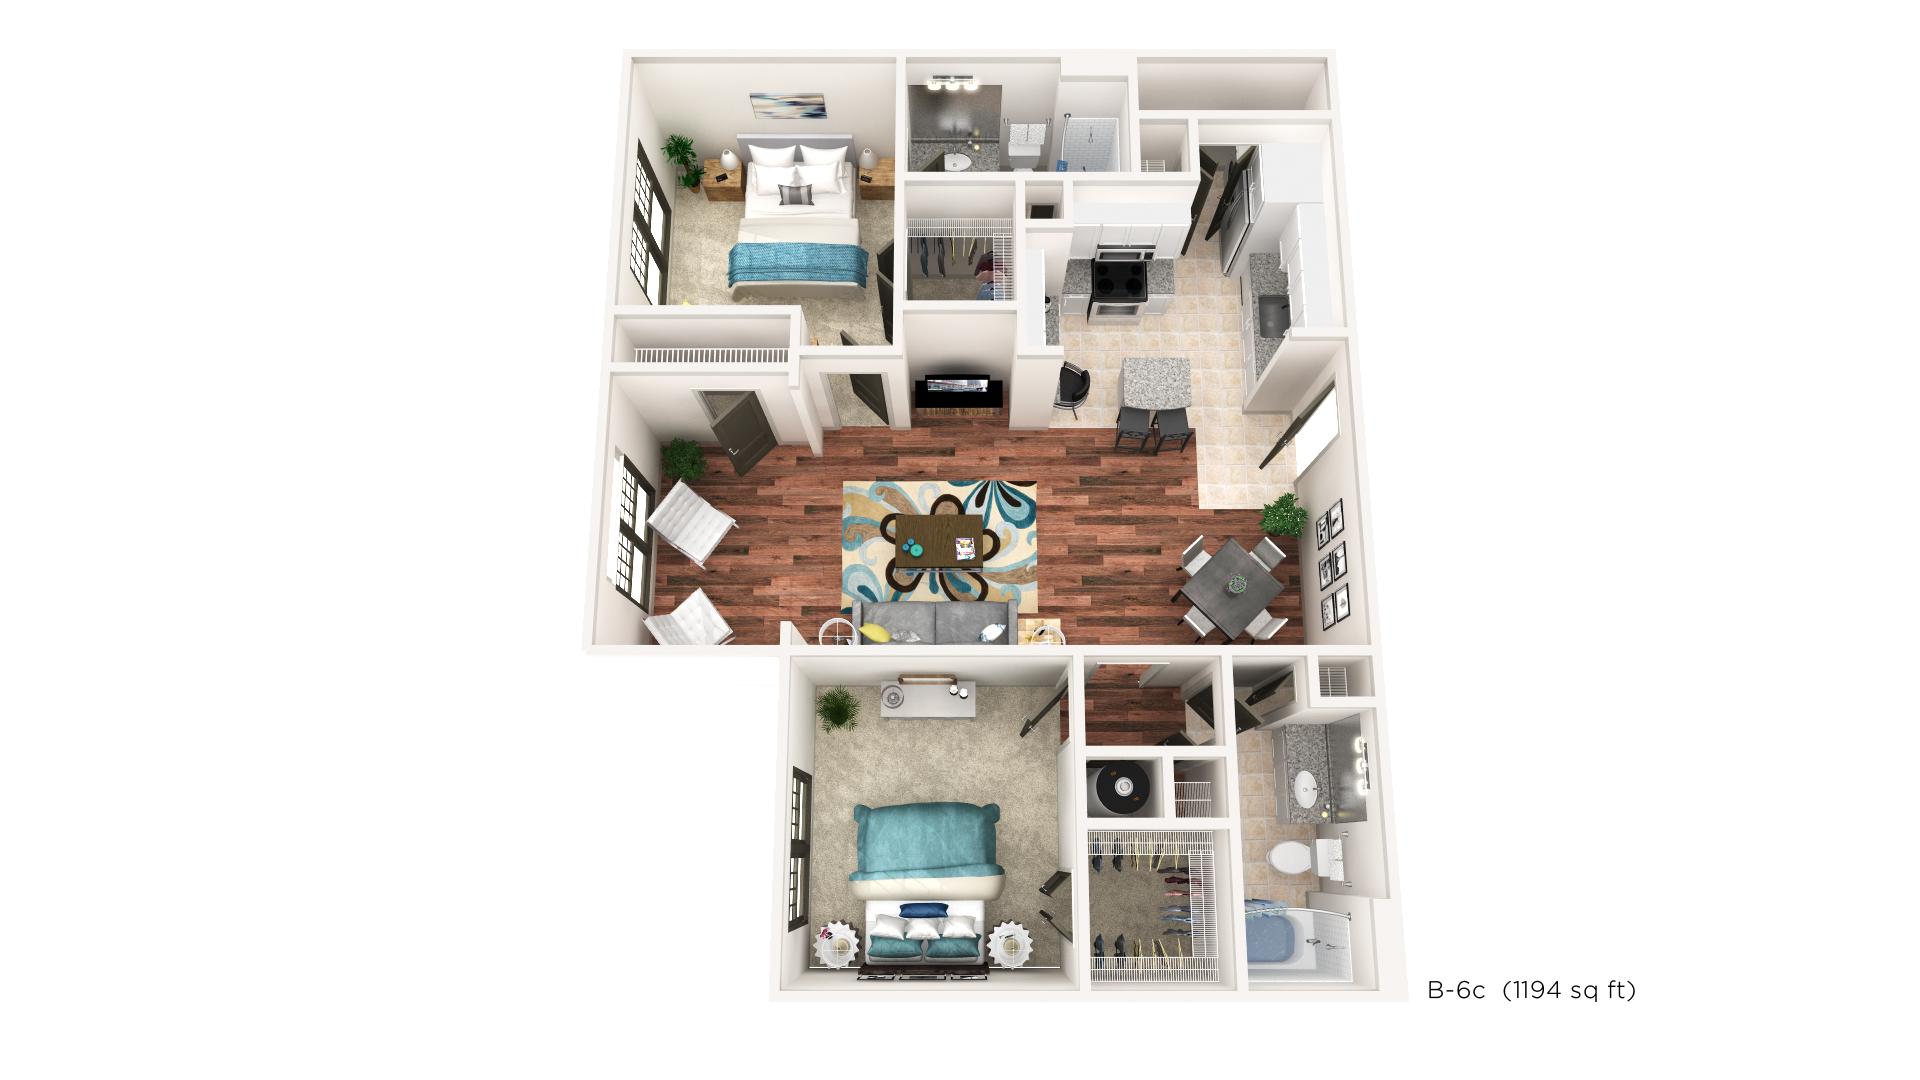 Brookleigh Flats Luxury Apartment Homes - Floorplan - B-6C